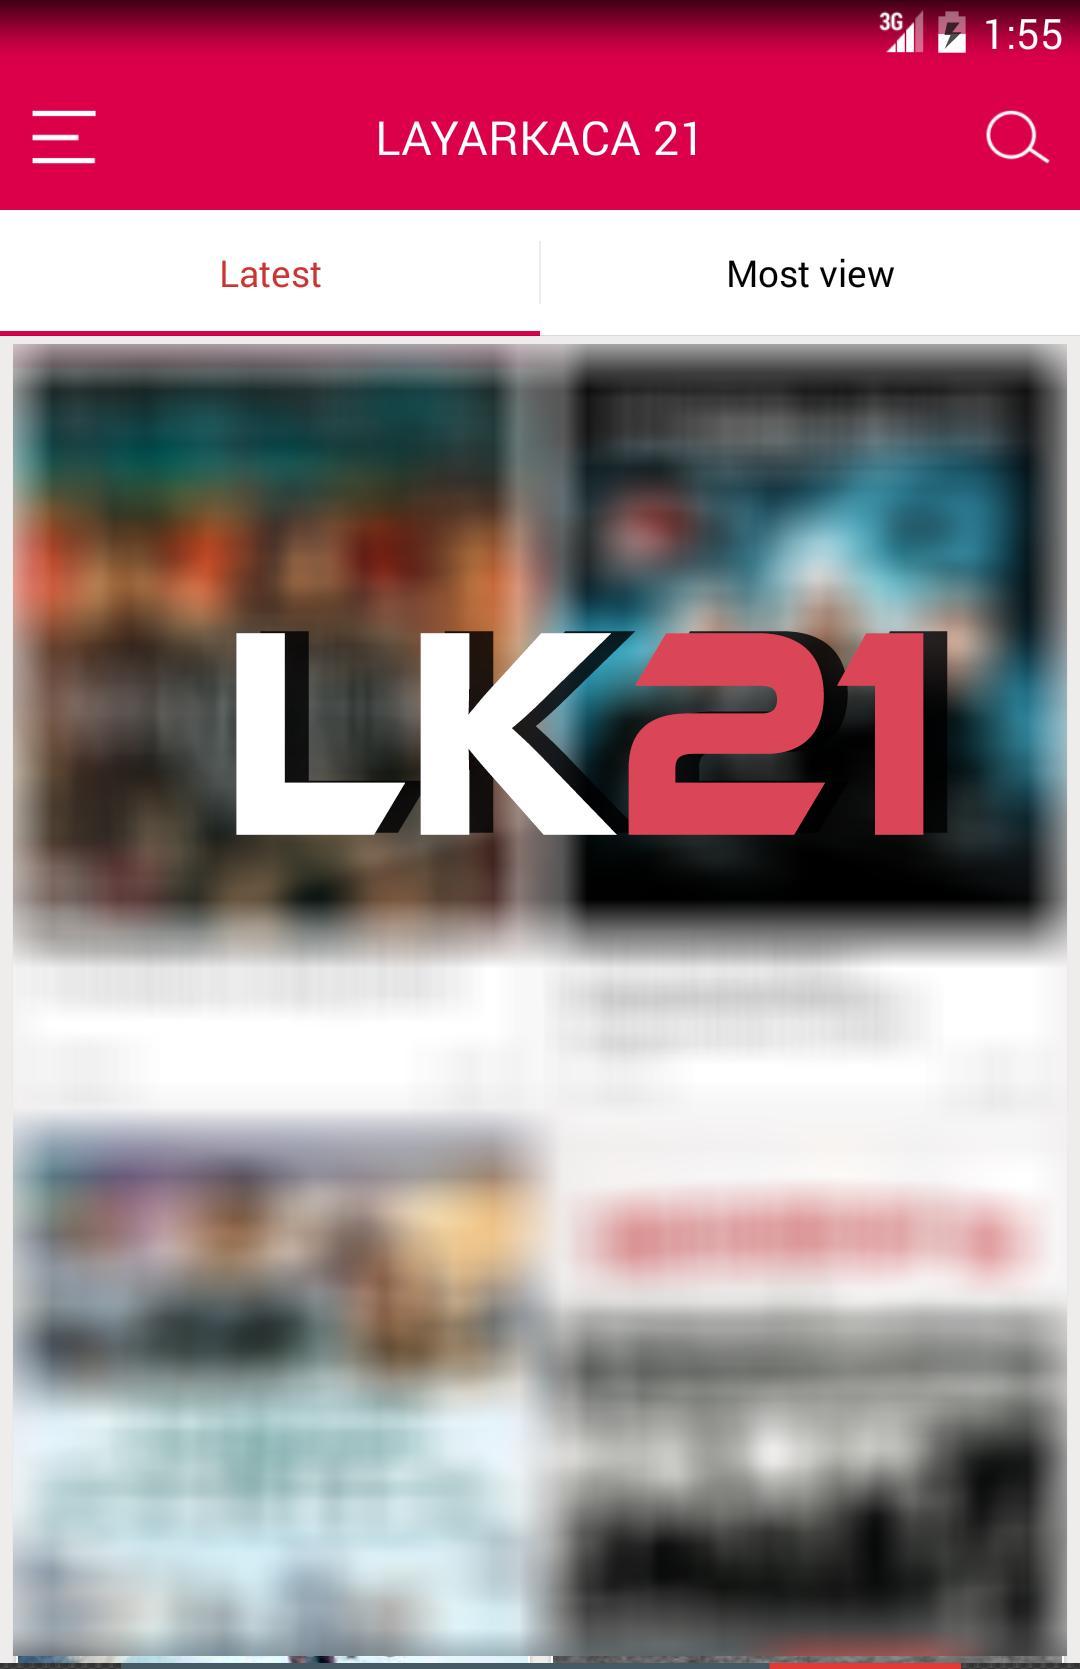 Layarkaca 21 For Android Apk Download